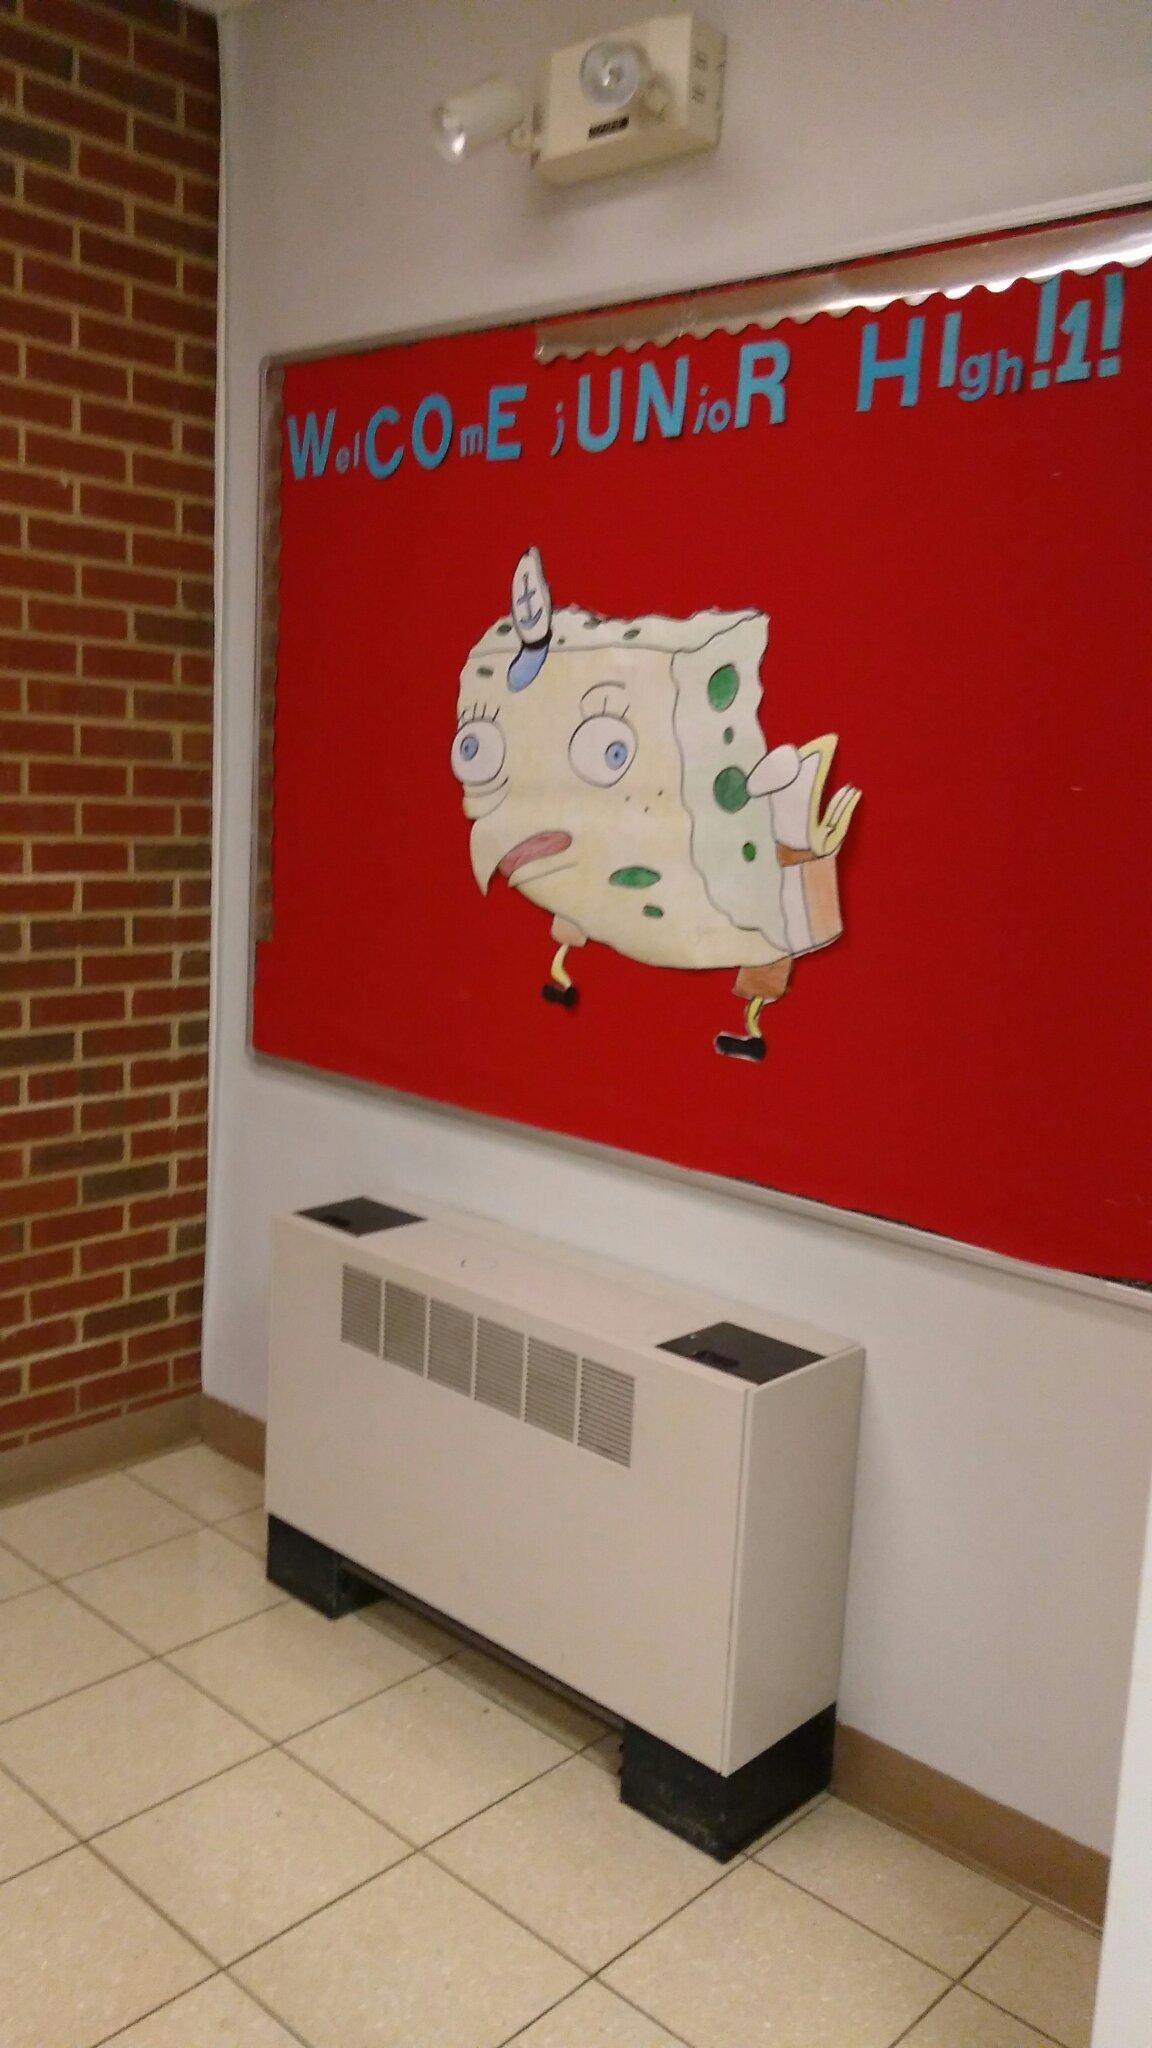 My school loves spongebob memes.